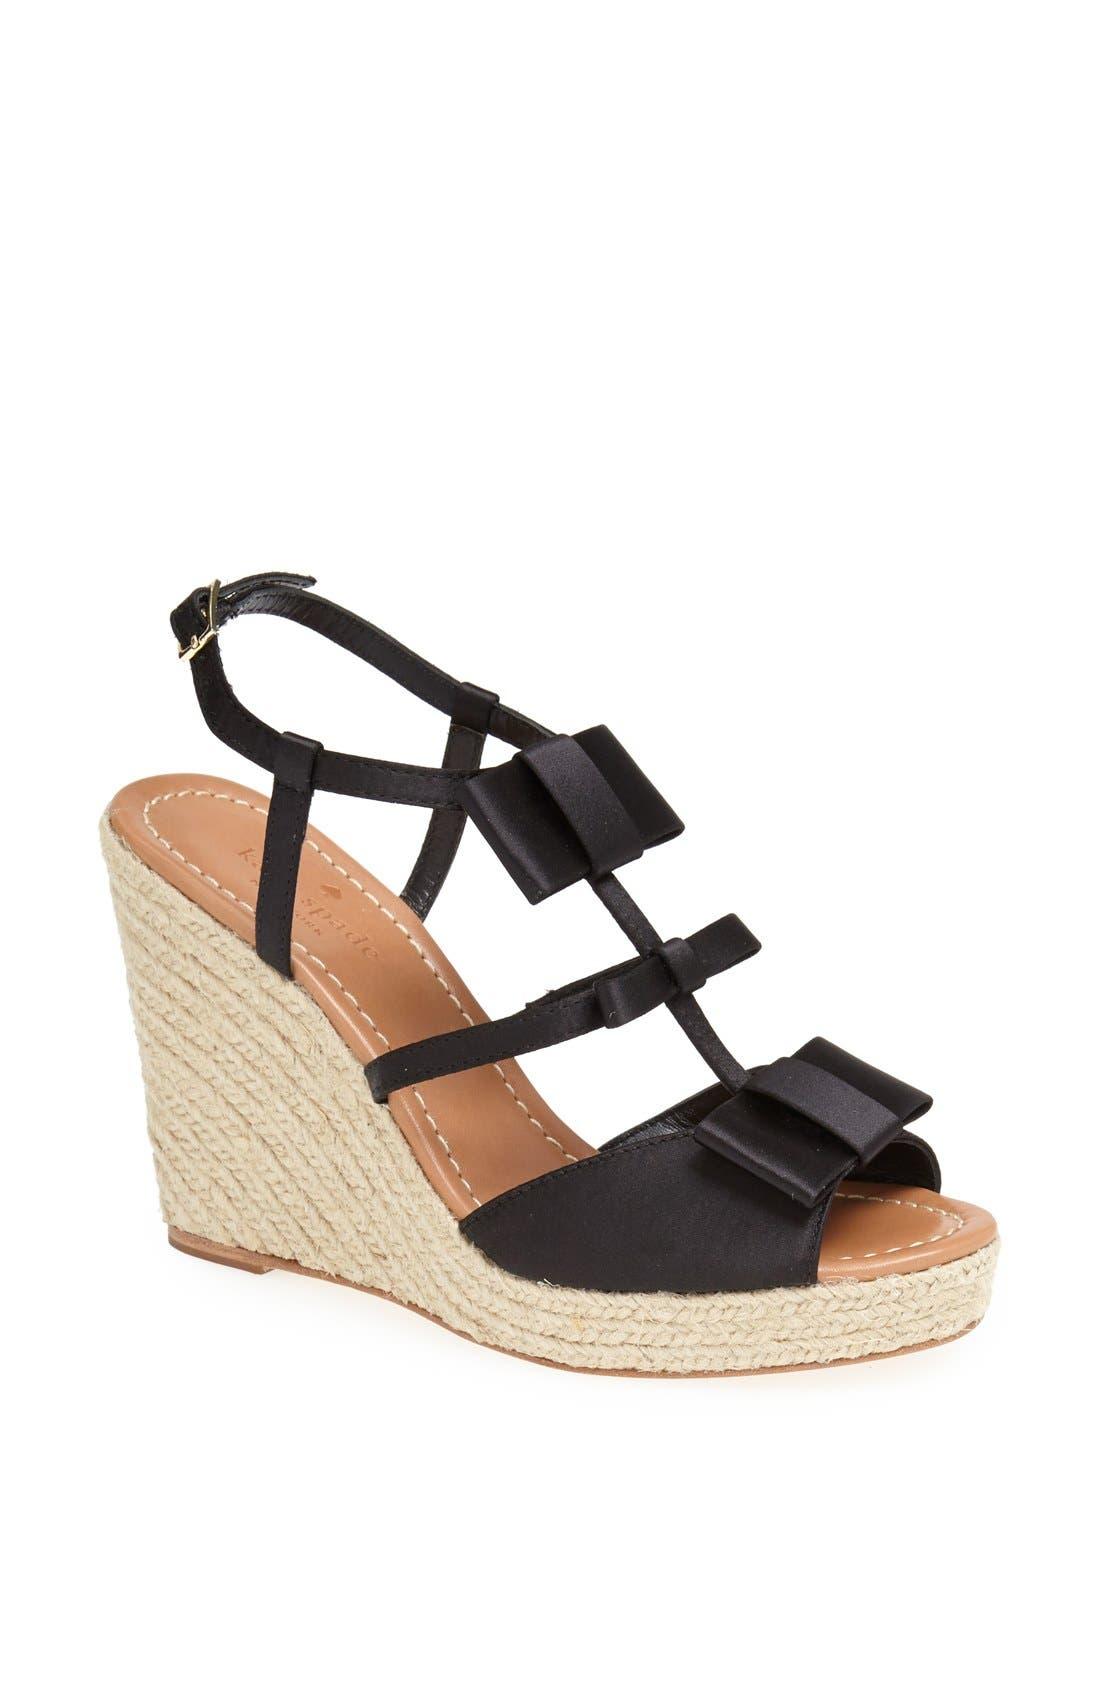 Main Image - kate spade new york 'juju' wedge sandal